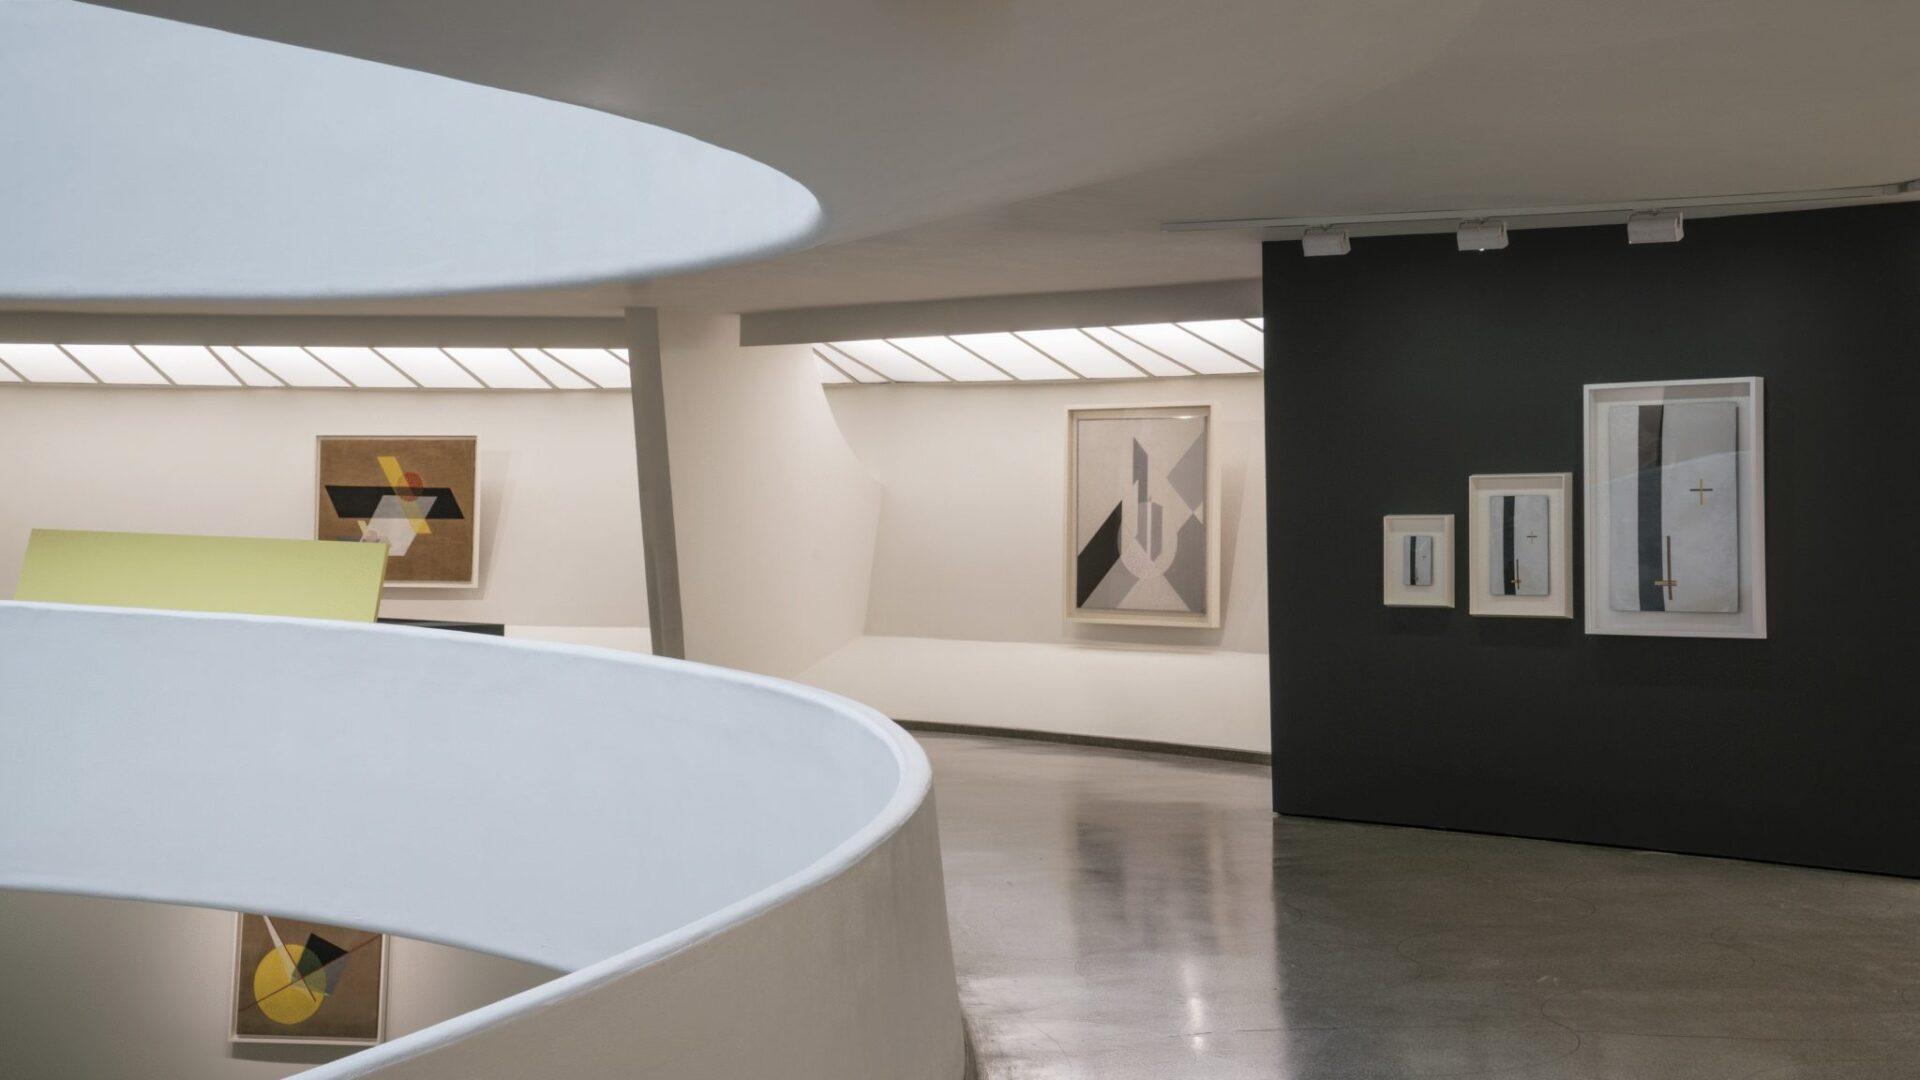 (Image 1) Installation view: Moholy-Nagy: Future Present, Solomon R. Guggenheim Museum, New York, May 27-September 7, 2016. Photo: David Heald © Solomon R. Guggenheim Foundation